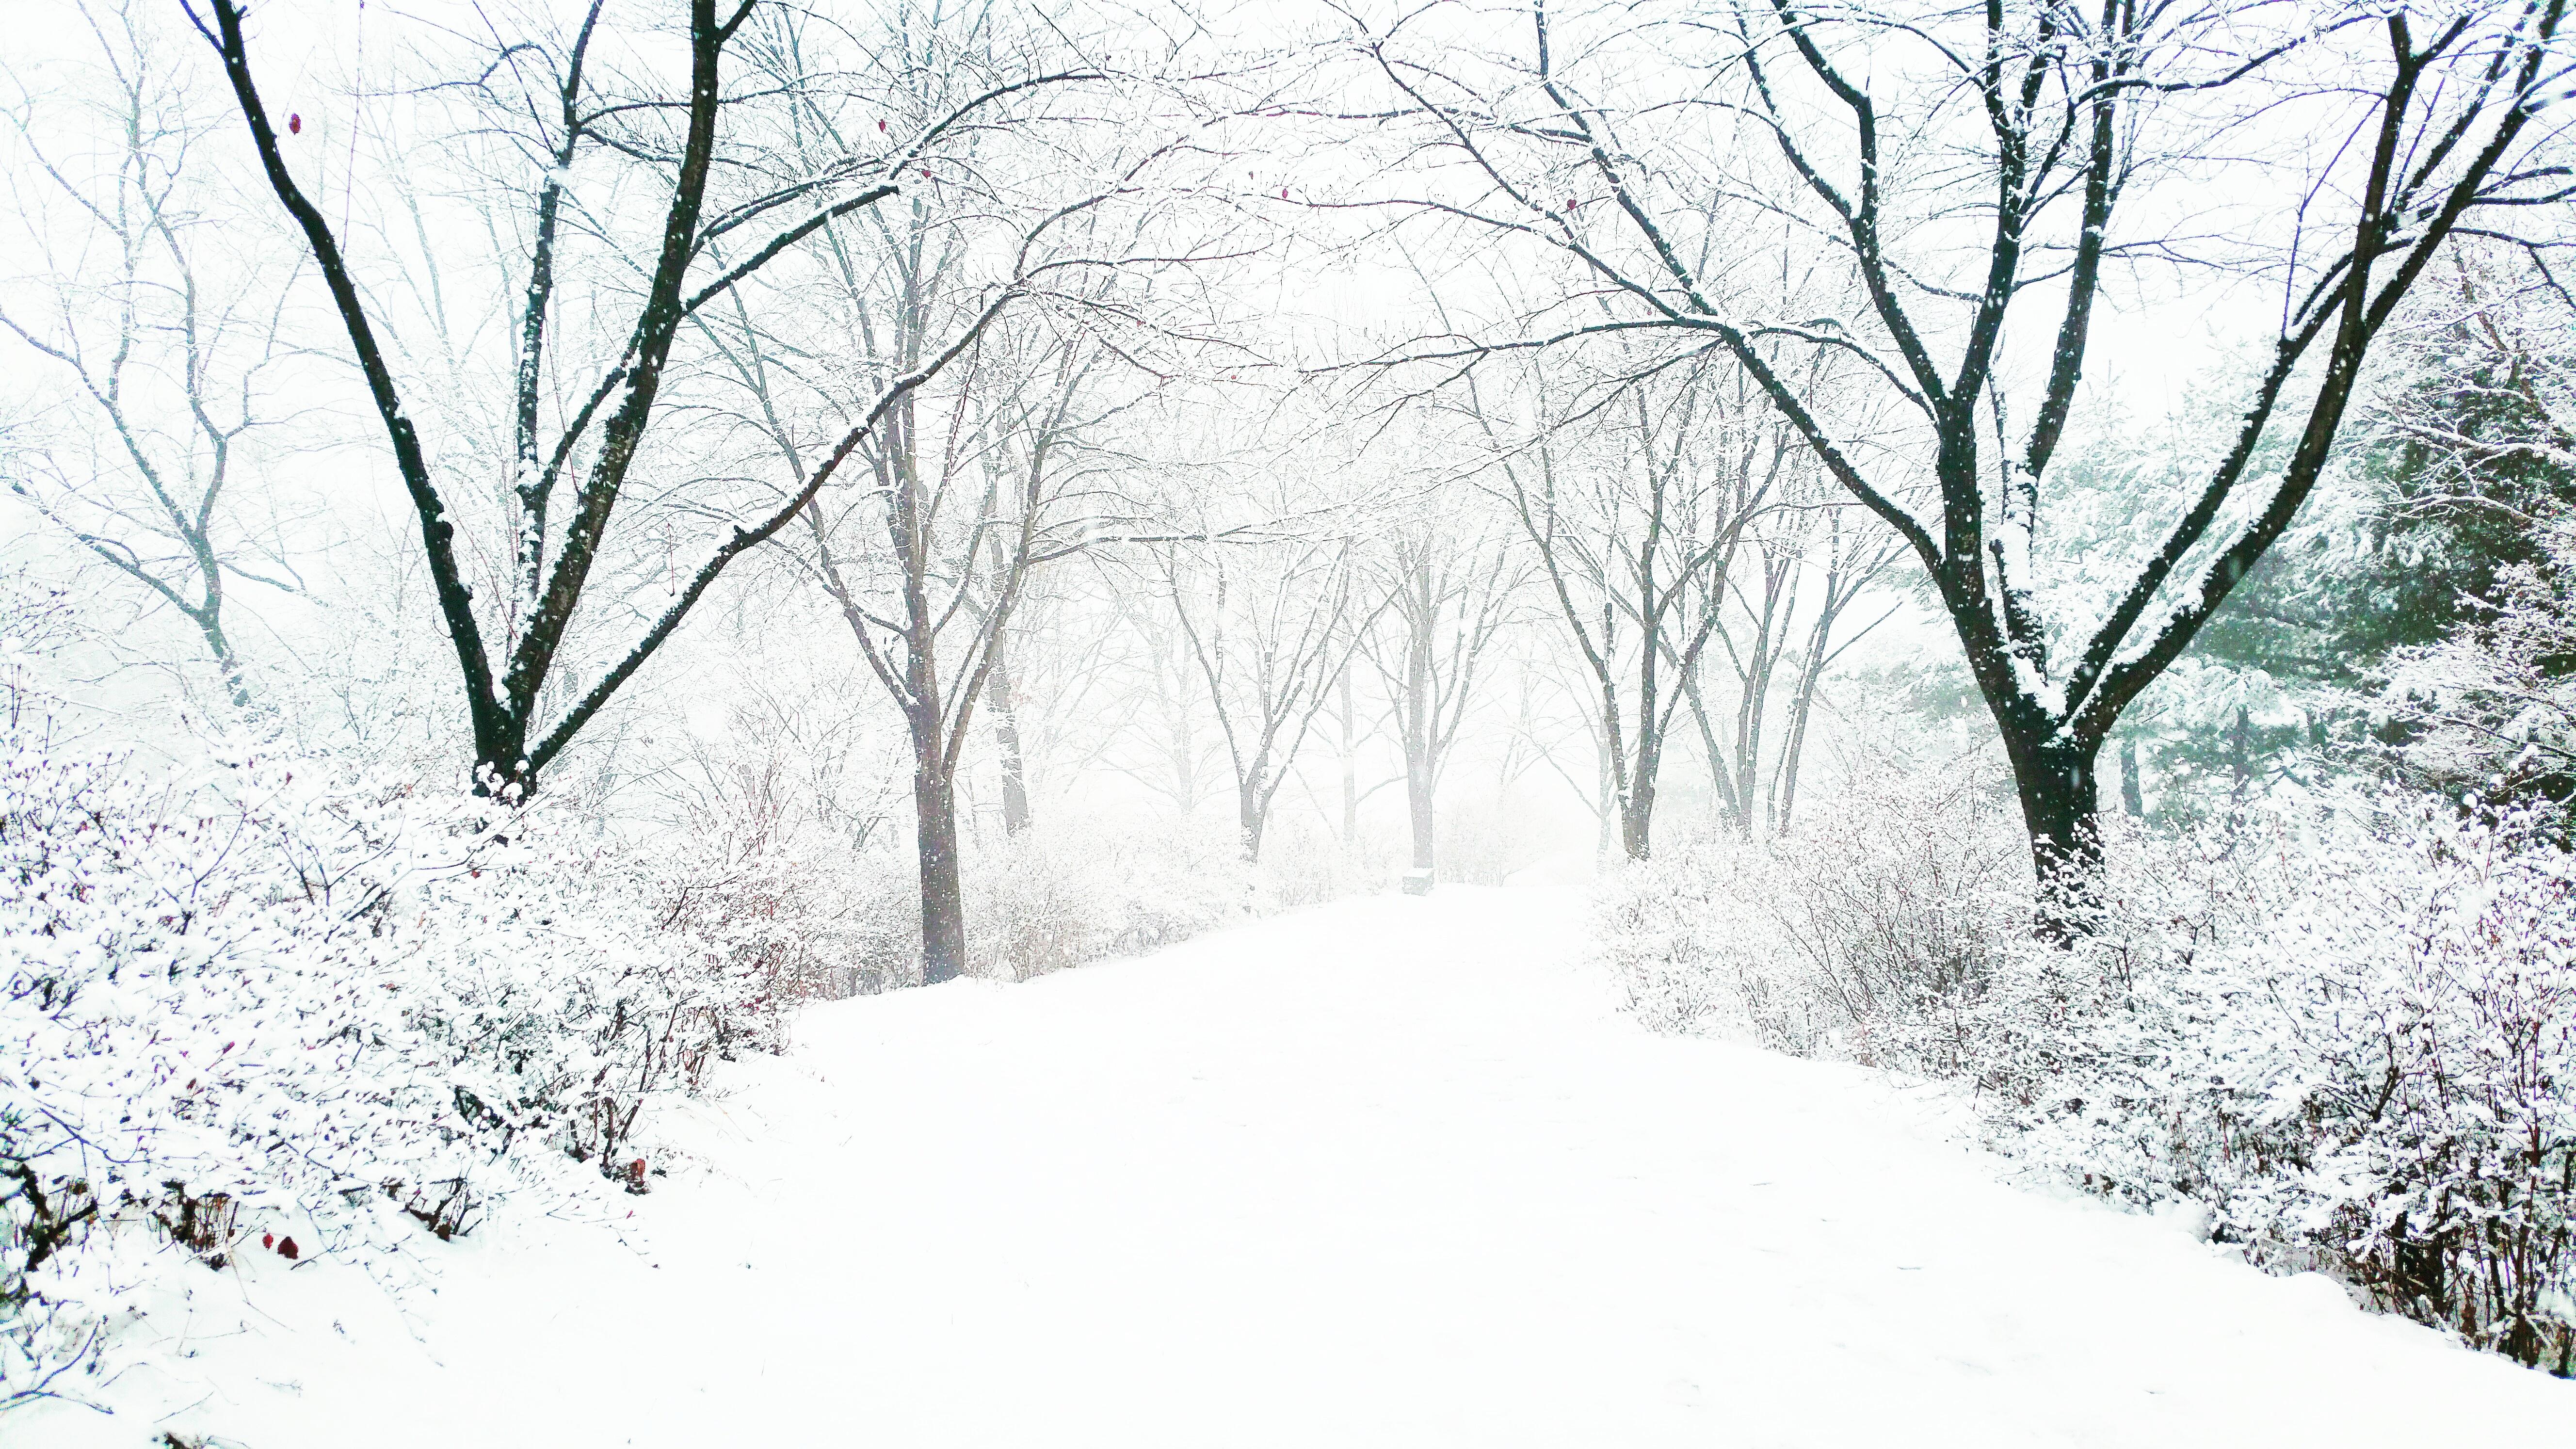 December 24, 2017, 雲, 雪岳, 韓国, 風景, HQ Photo